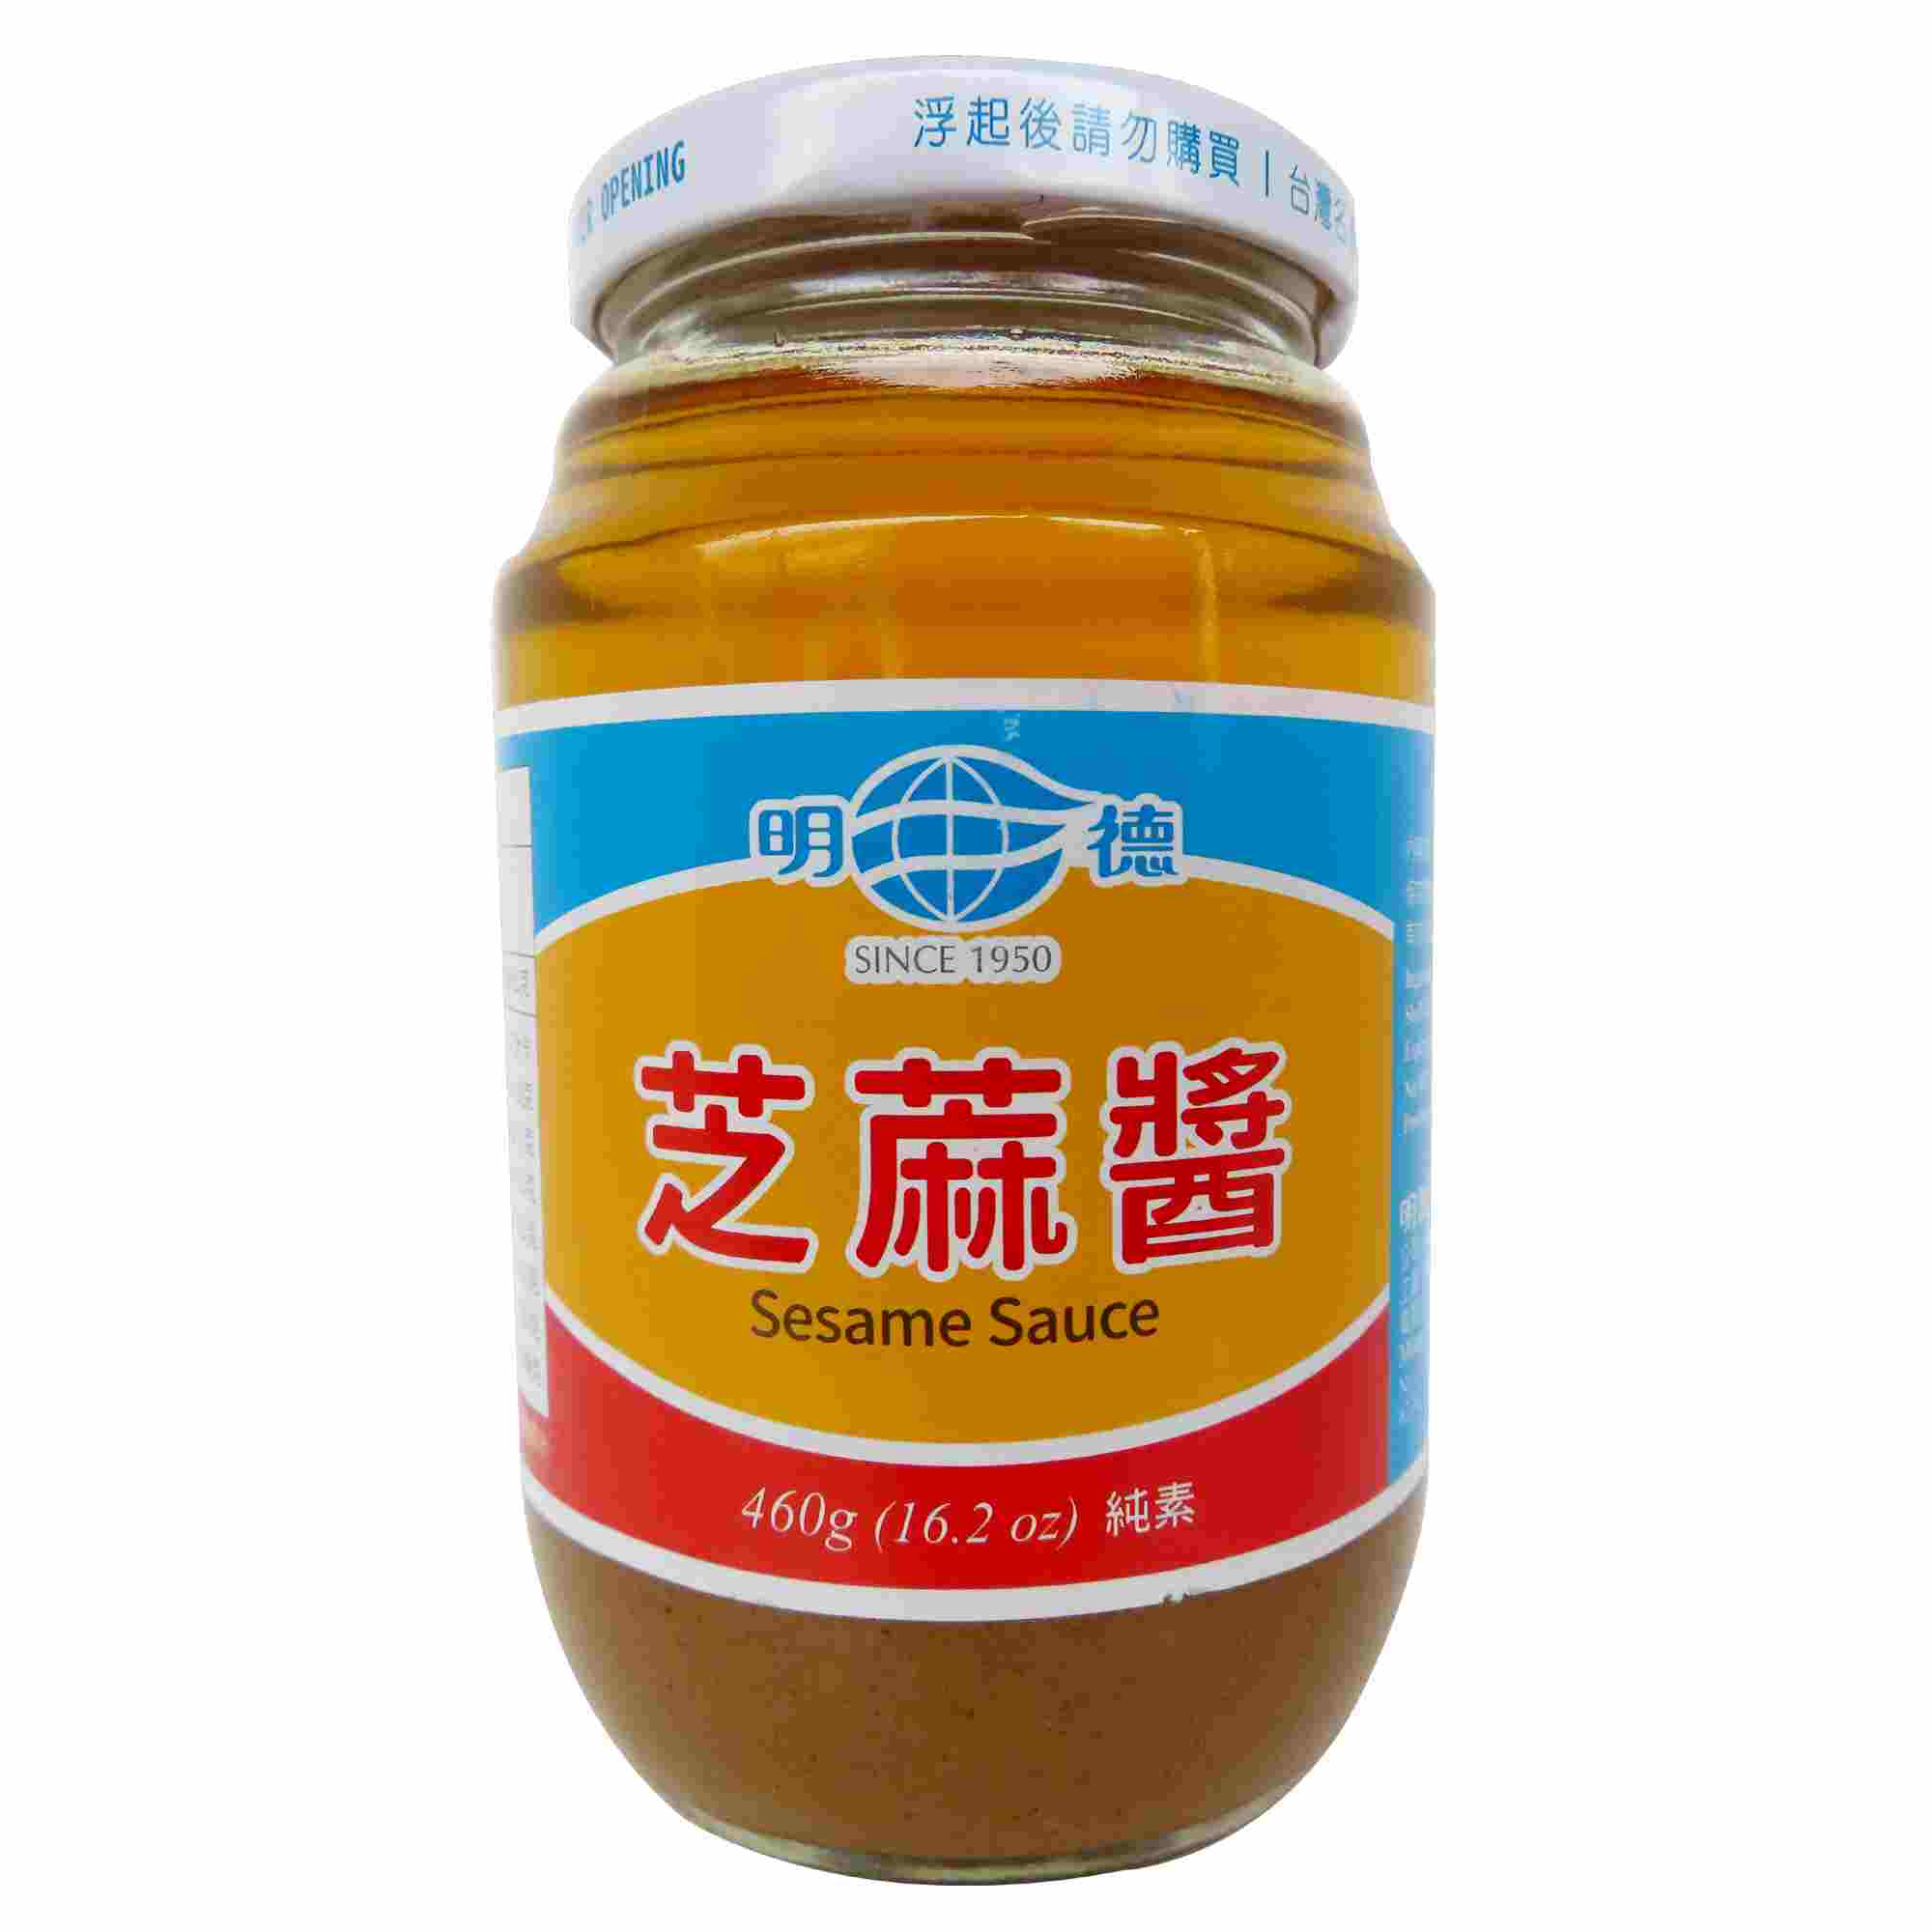 Image Ming De Sesame Sauce 明德-芝麻醬 460 grams